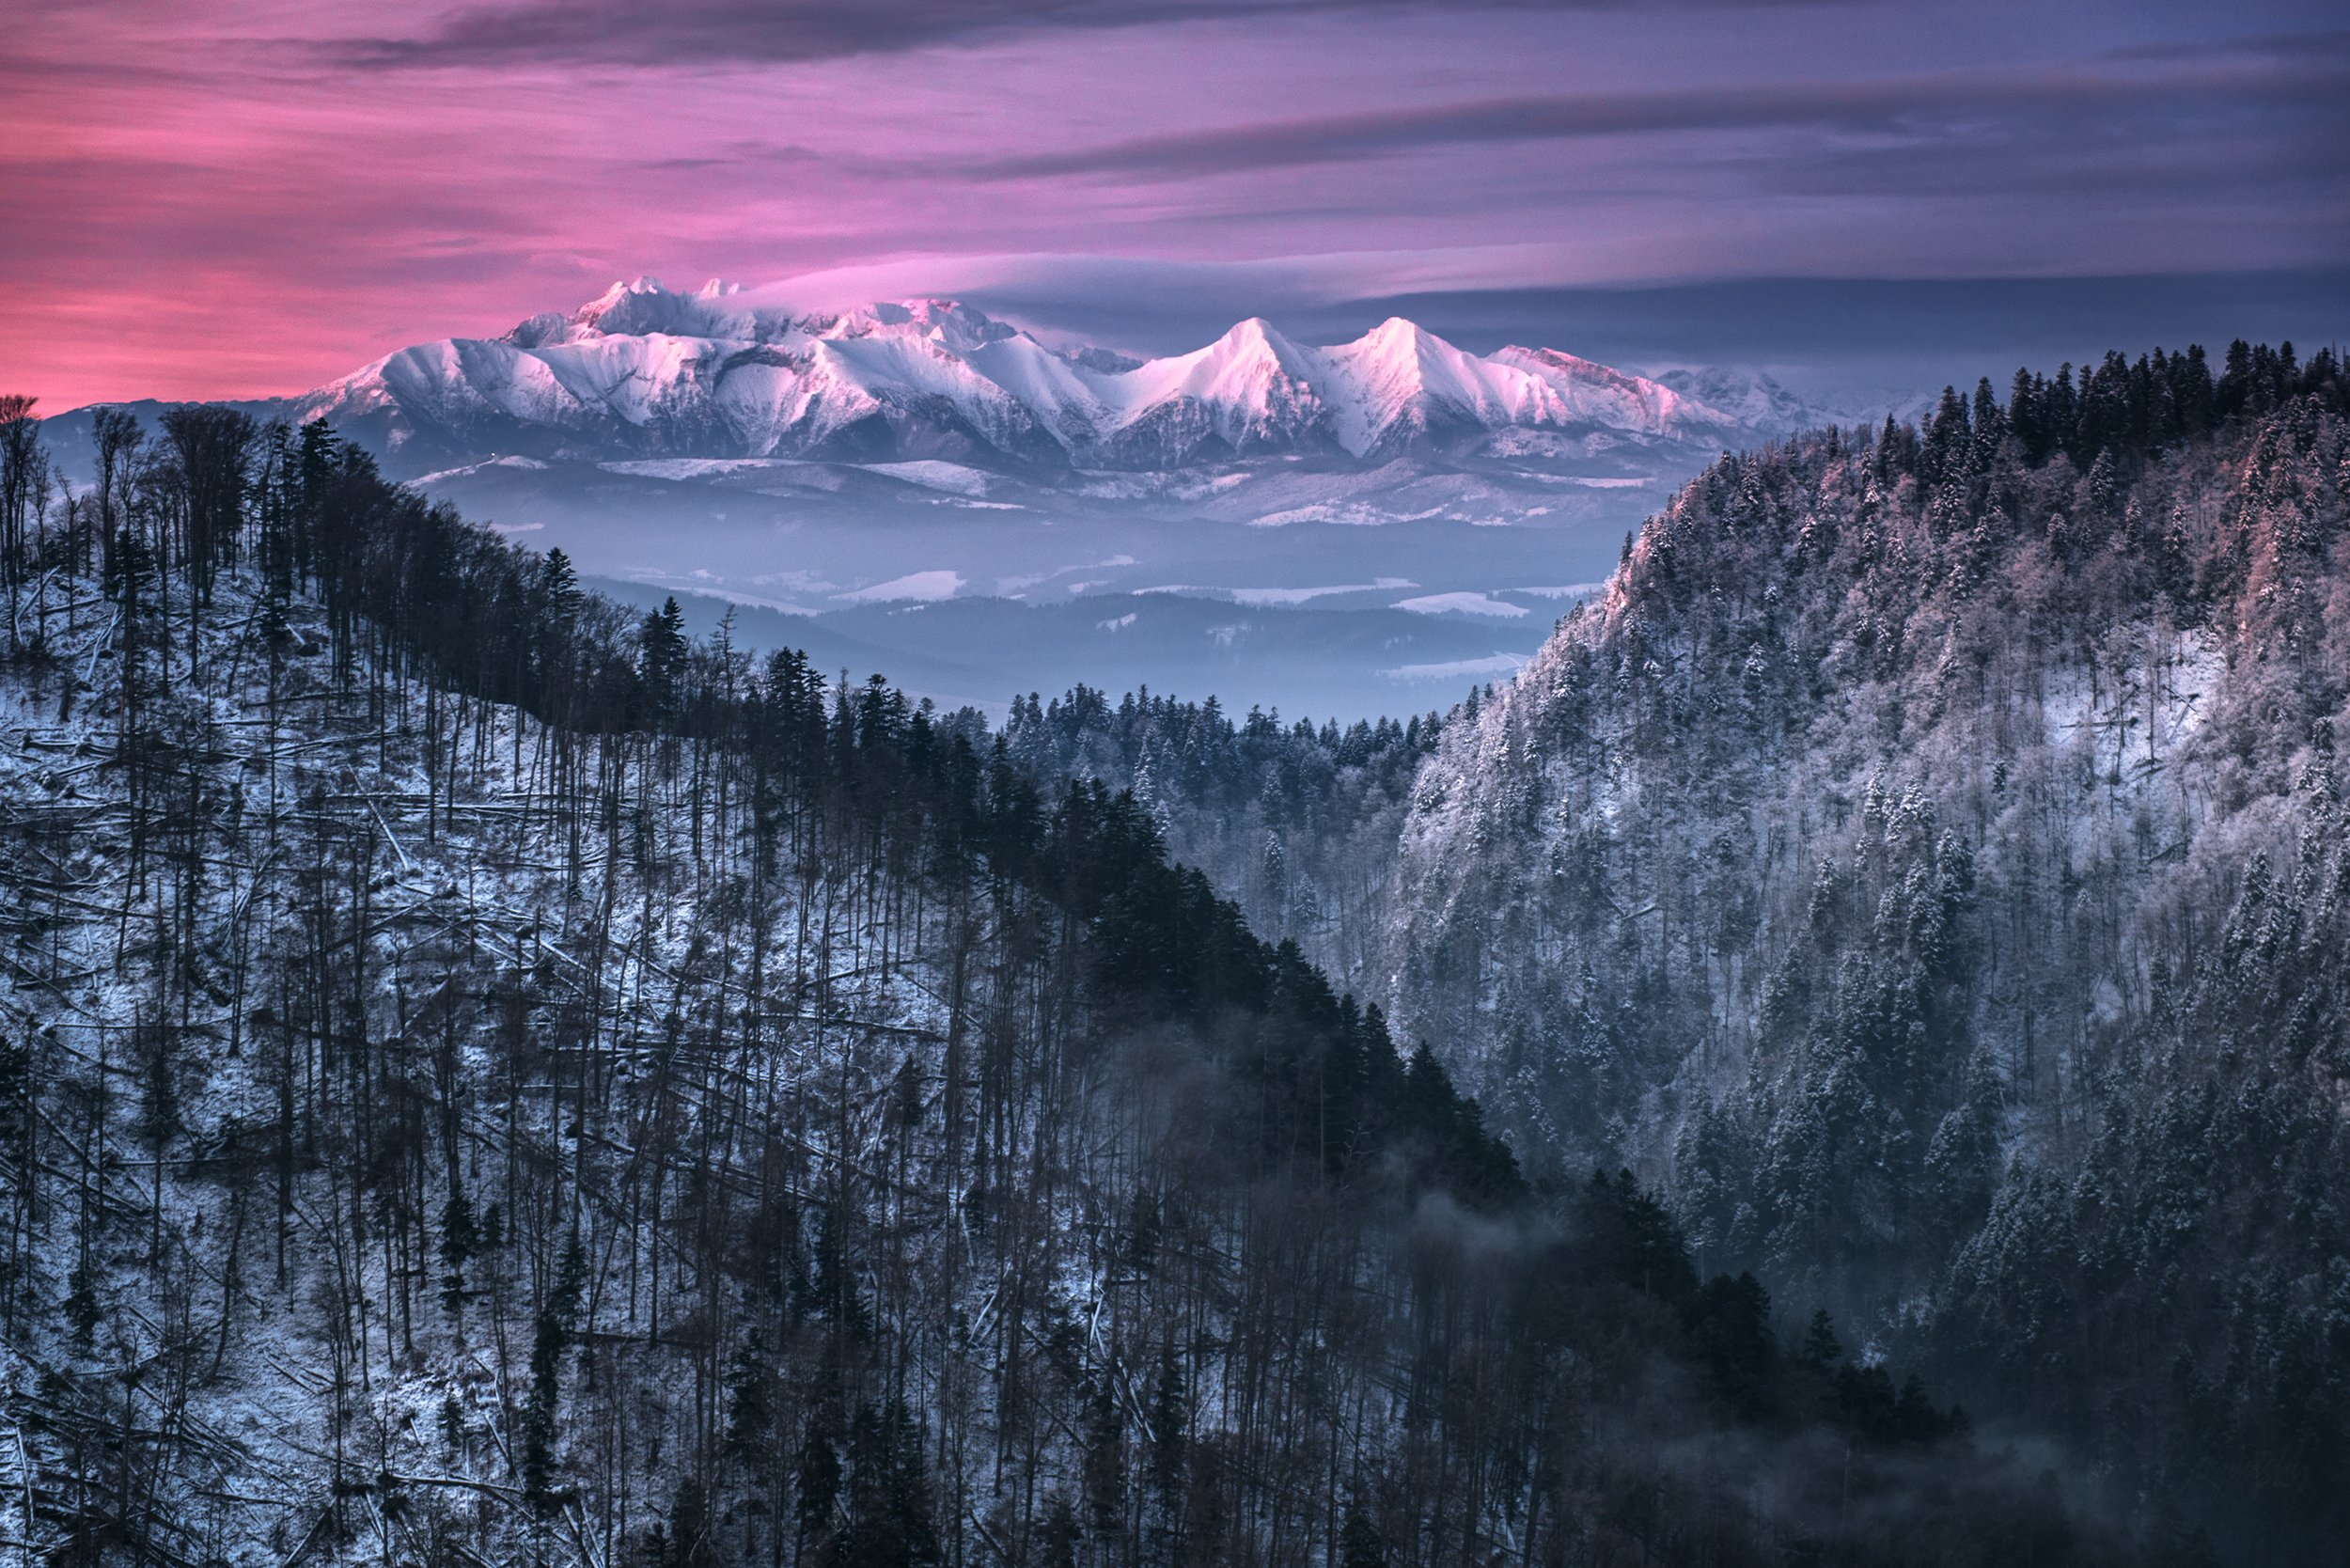 mountains, poland, slovakia, tatry, pieniny, light, sunrise, sun, light, landscape, hills, warm, winter, cold, colors,, Bieganski Patryk